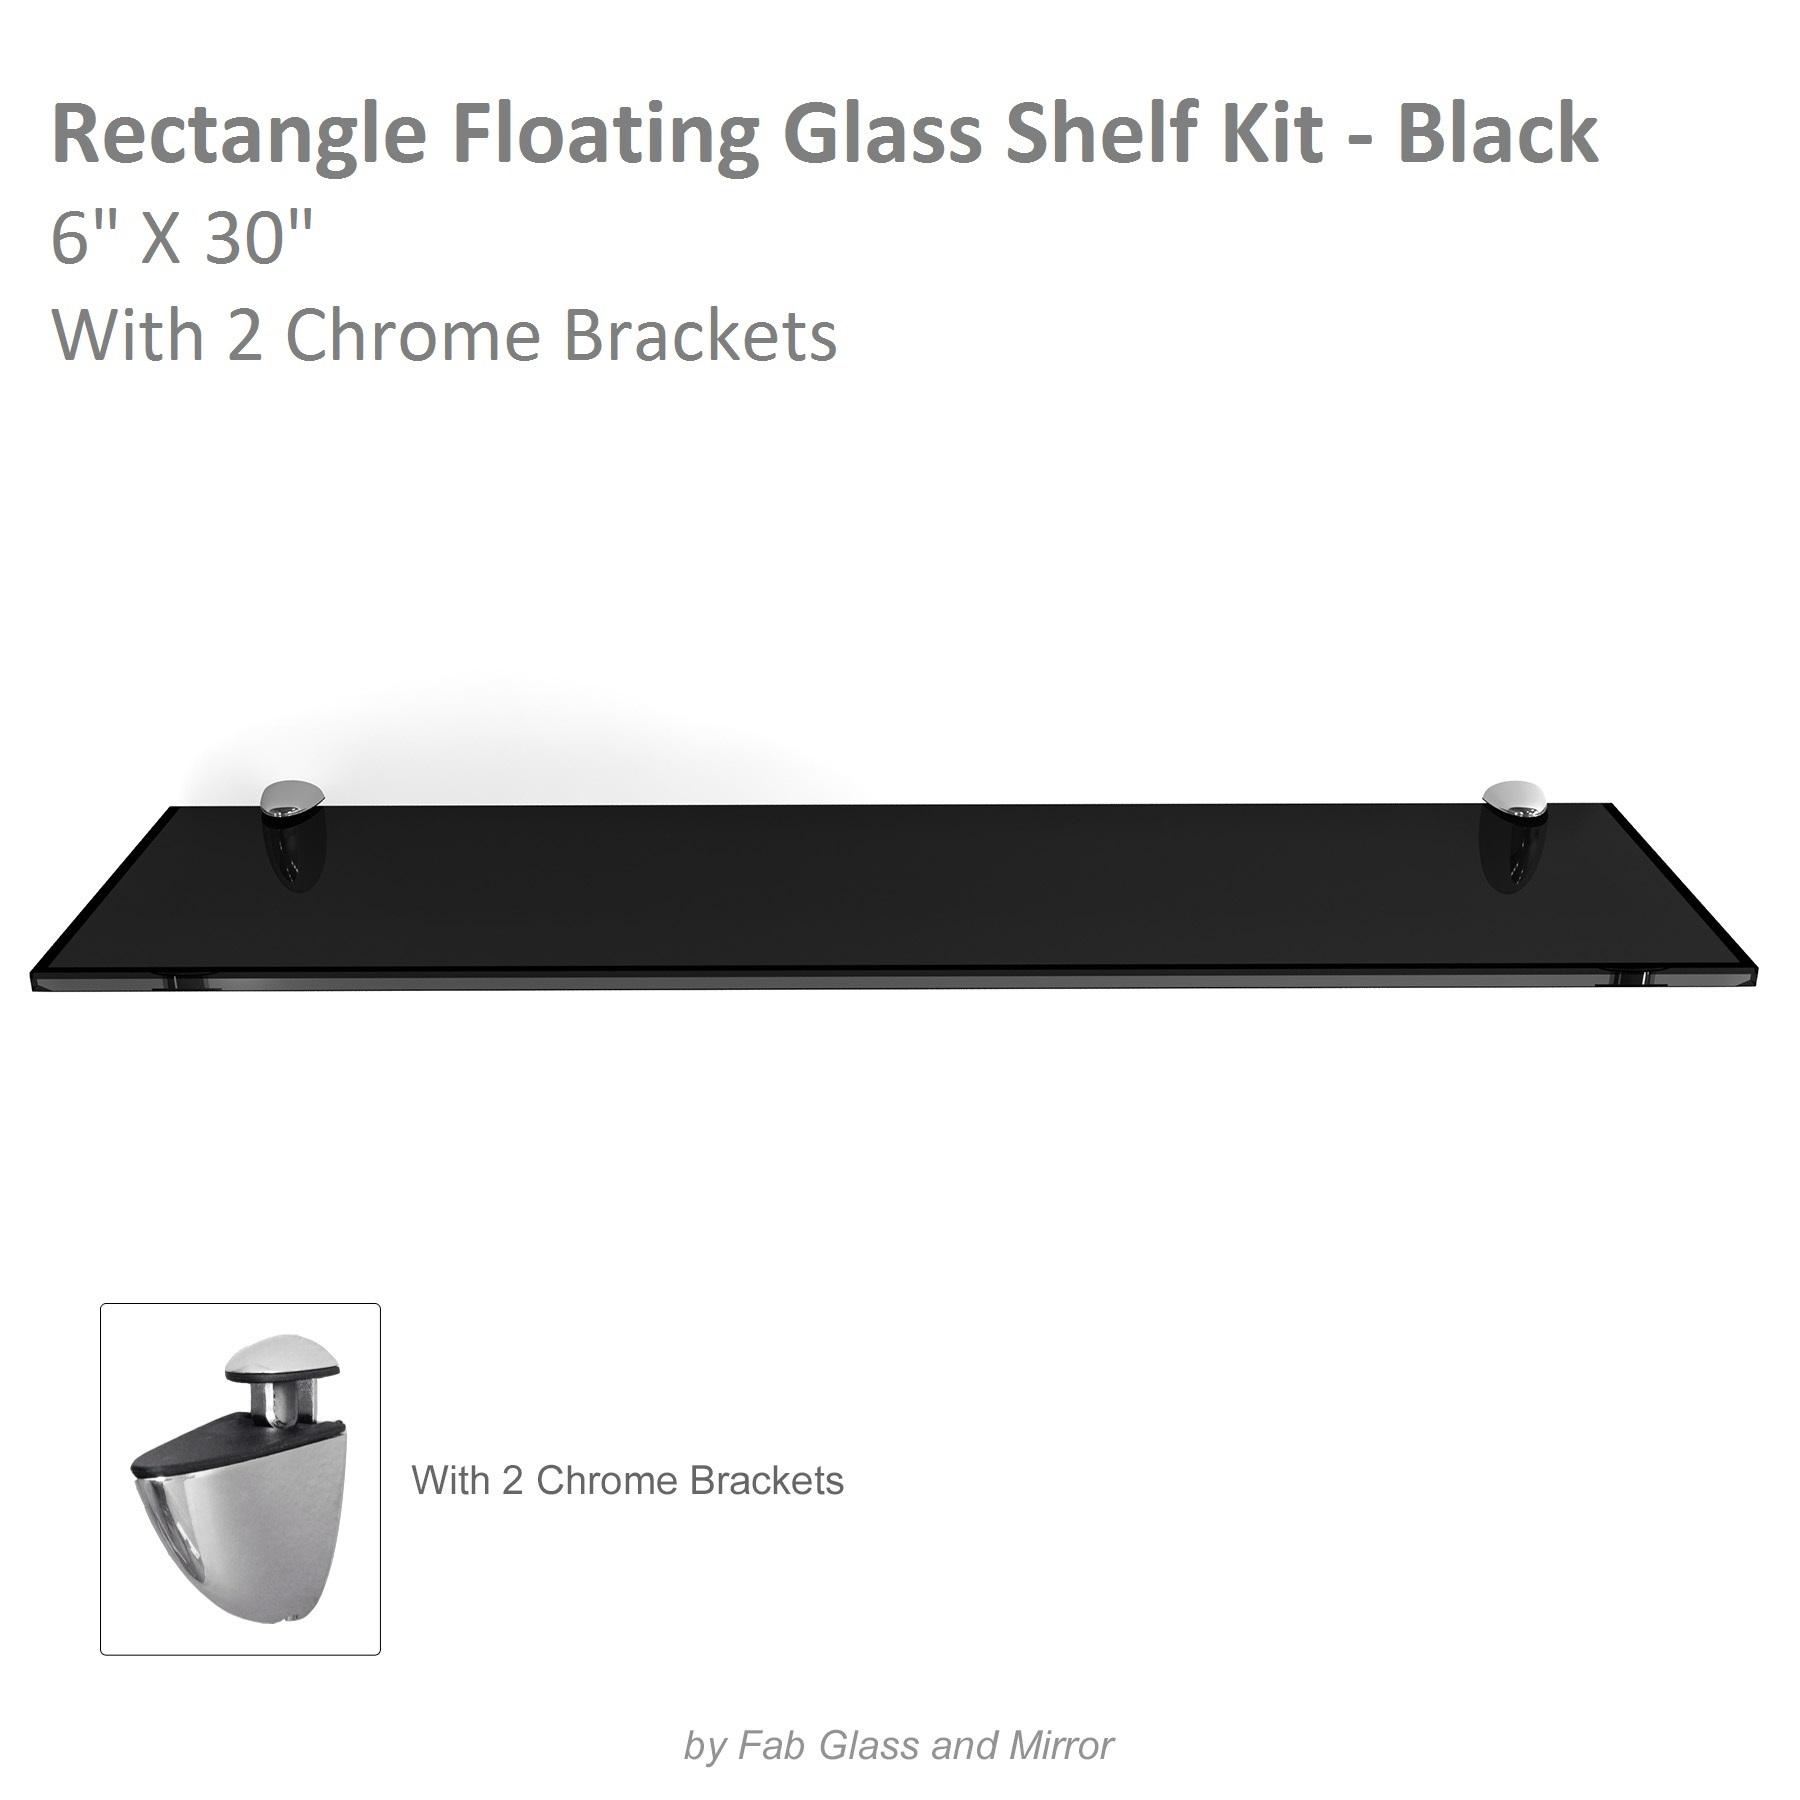 fab glass and mirror rectangle floating black glass shelf kit w brackets ebay. Black Bedroom Furniture Sets. Home Design Ideas